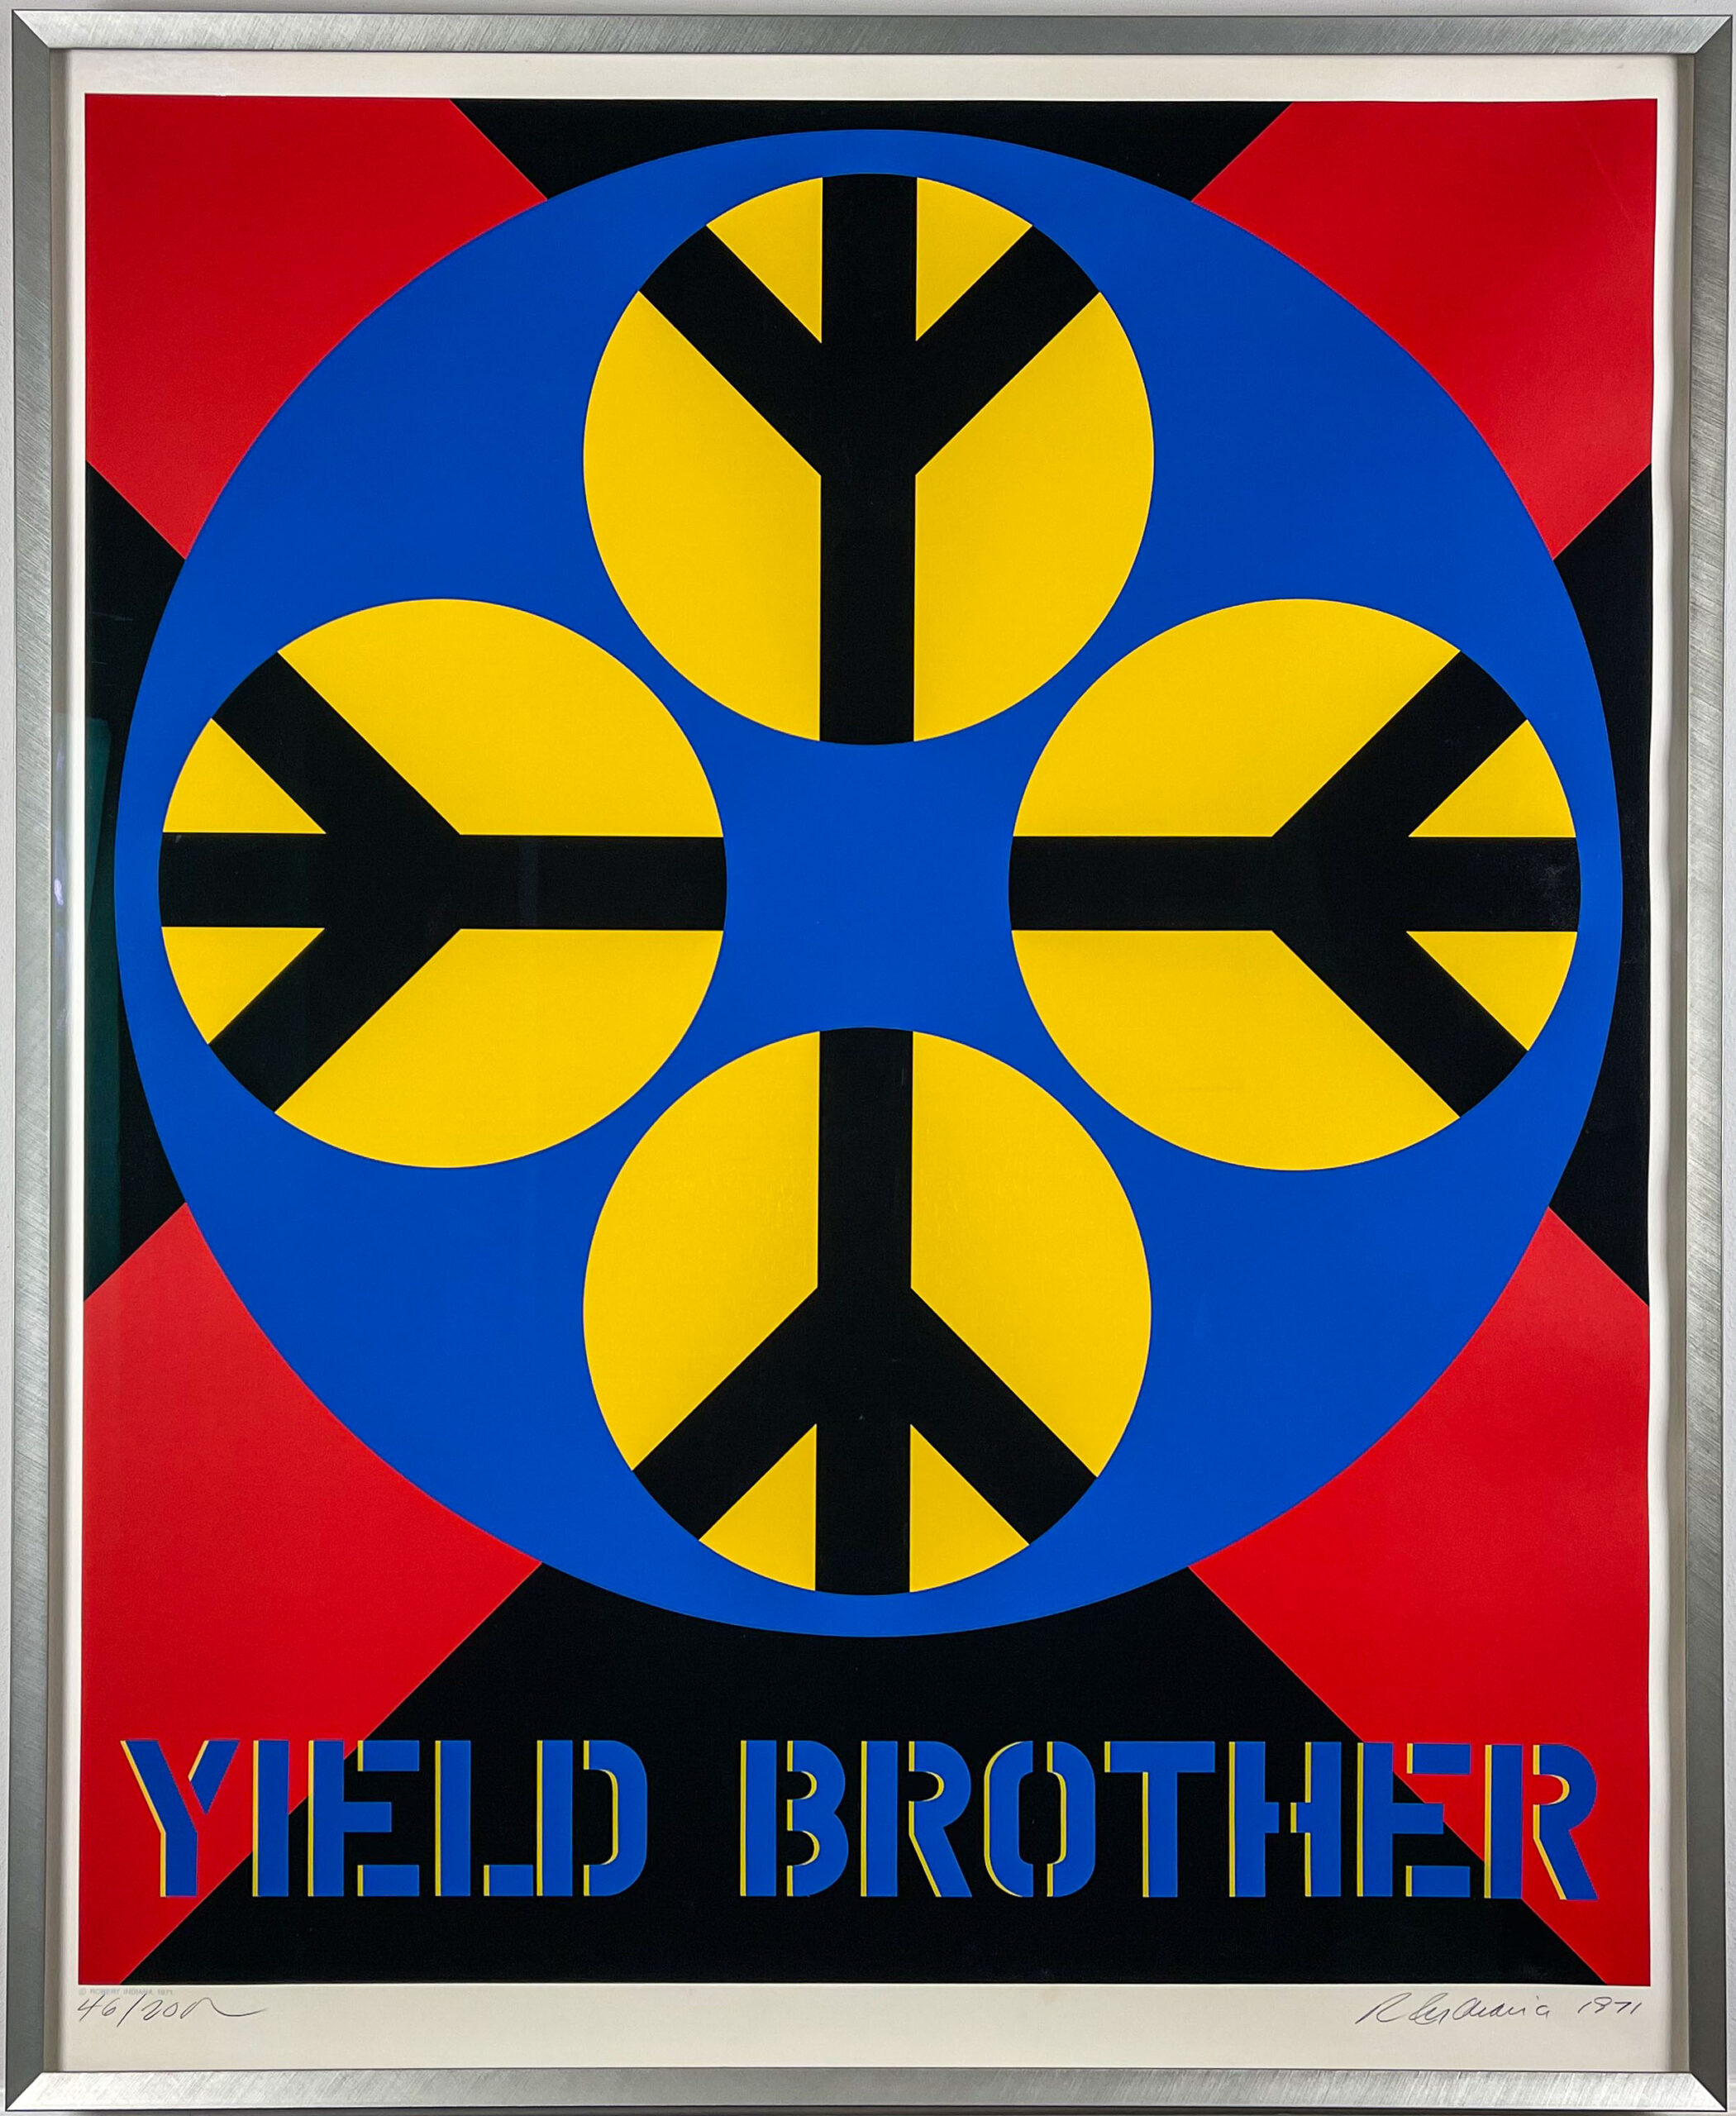 Robert Indiana Yield Brother 1971 Frame web-1